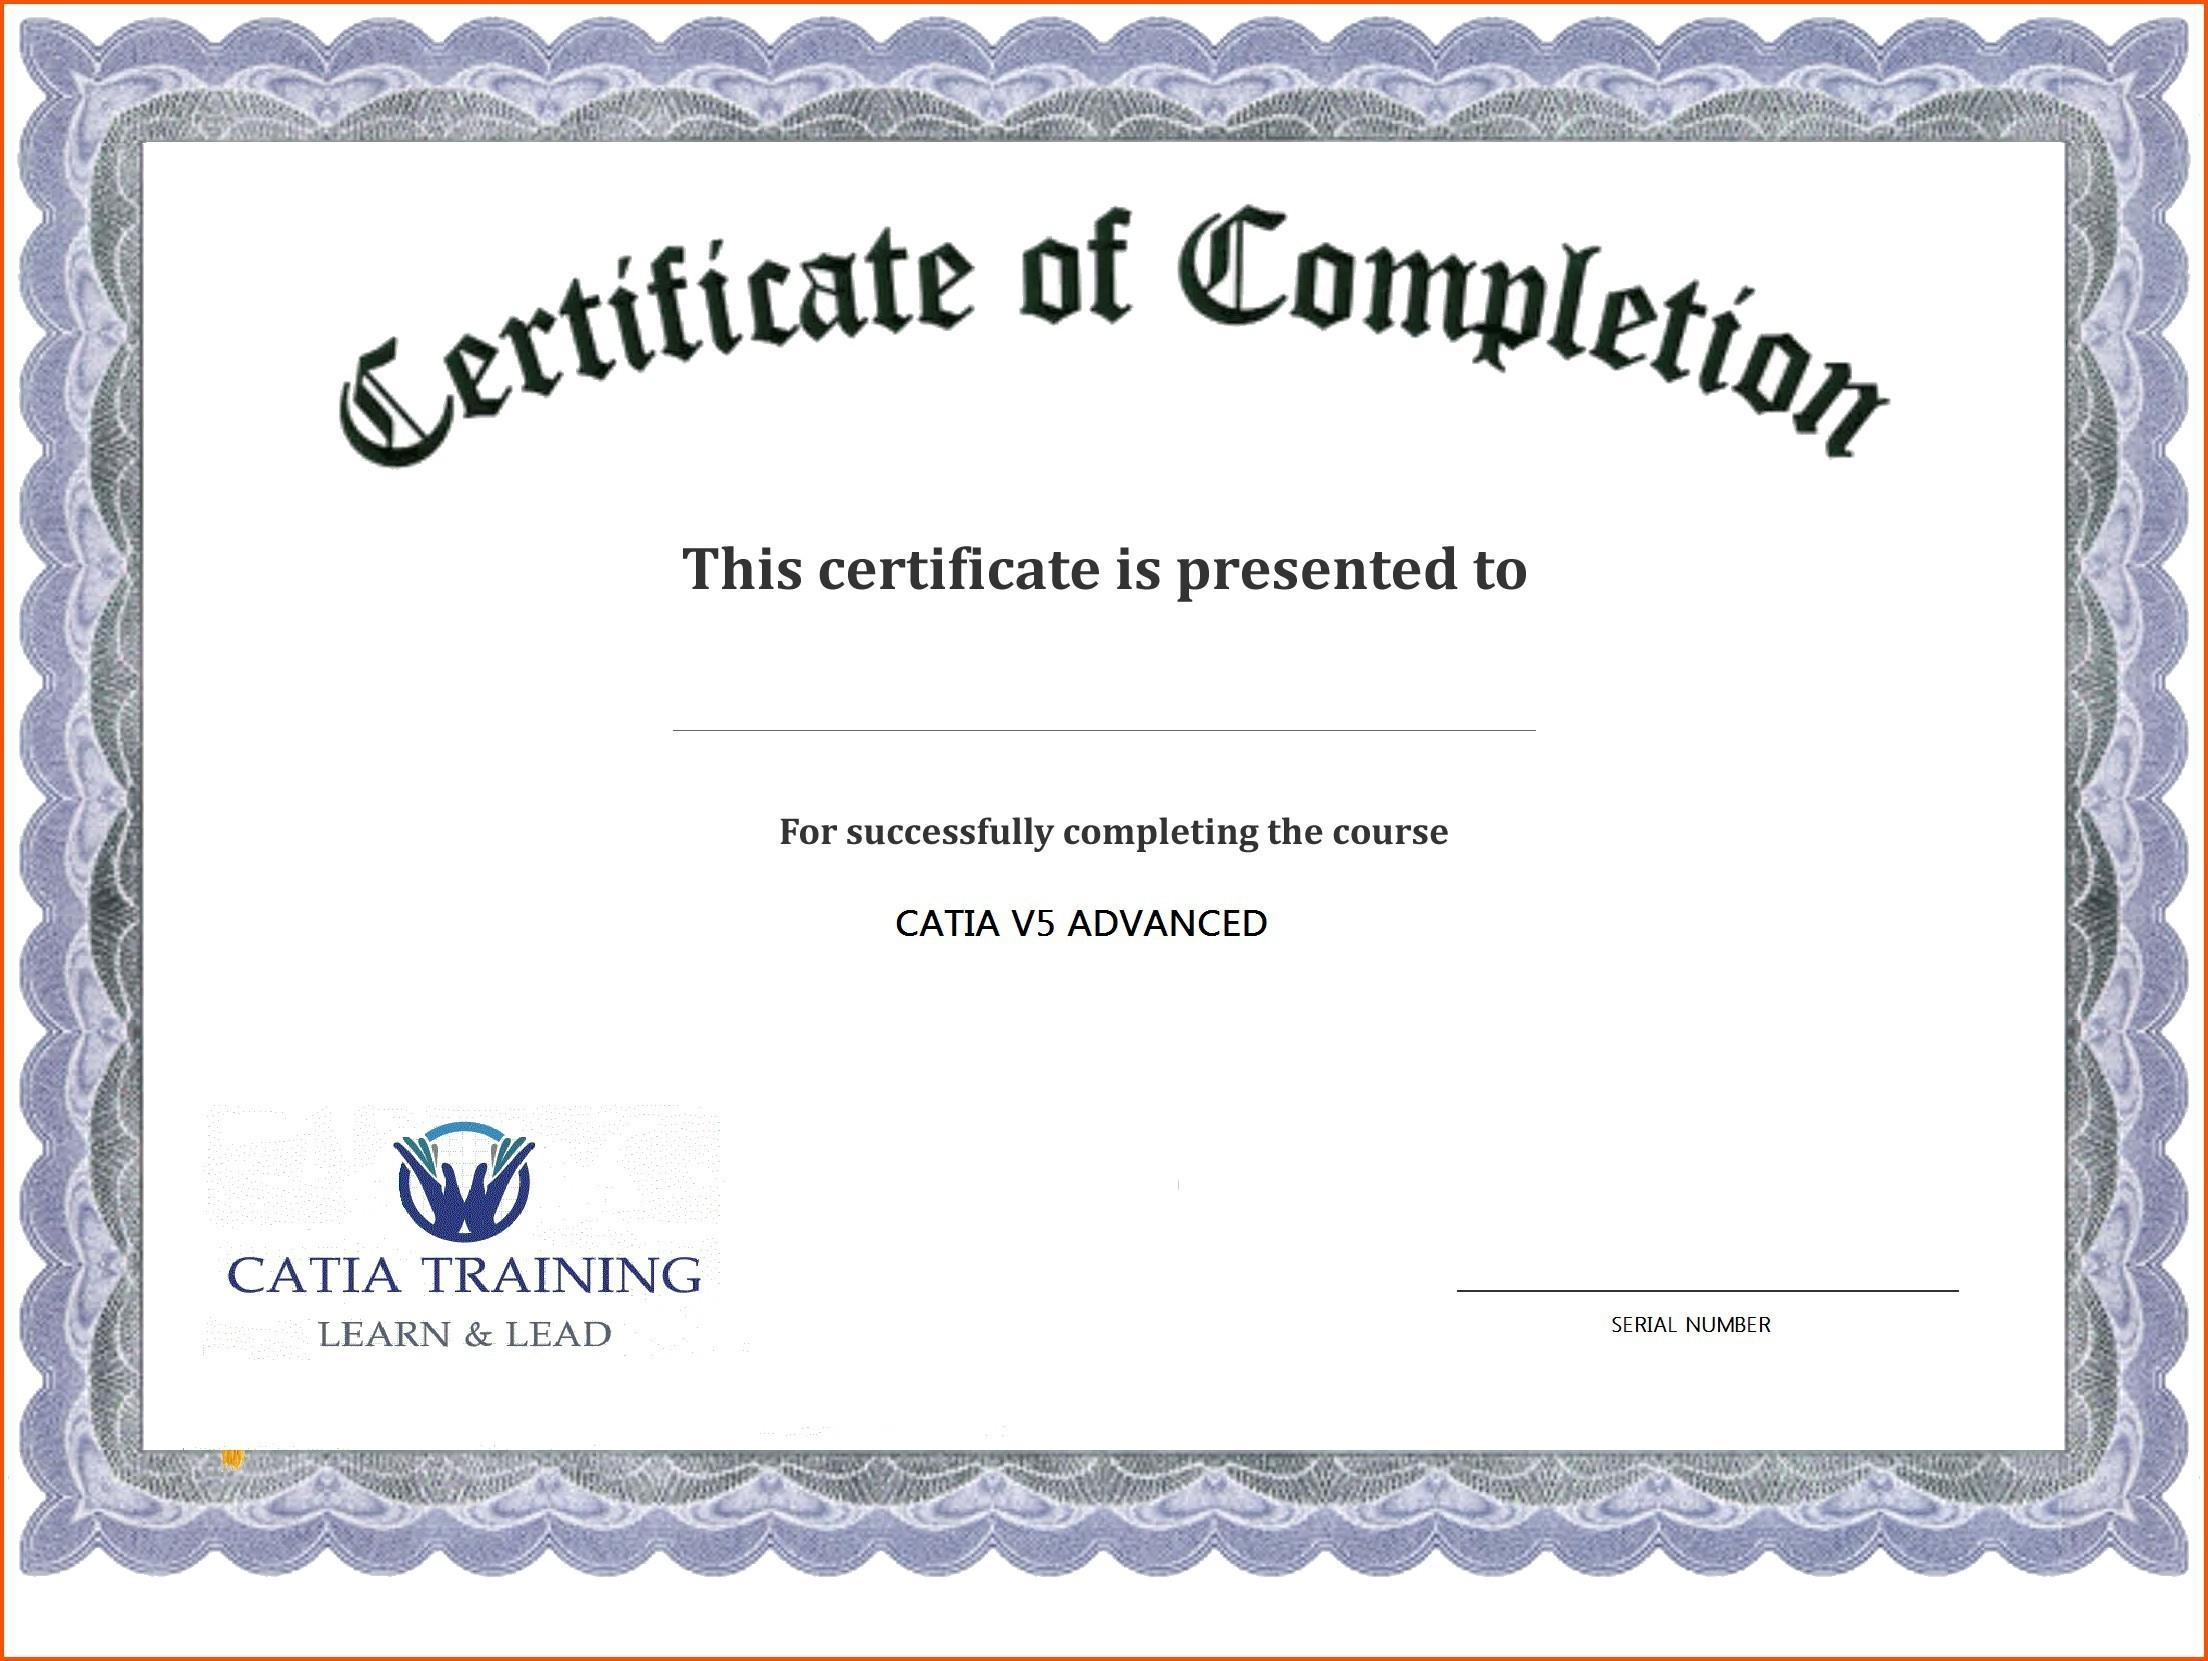 Free Customizable Printable Certificates Of Achievement - Hashtag Bg - Free Customizable Printable Certificates Of Achievement